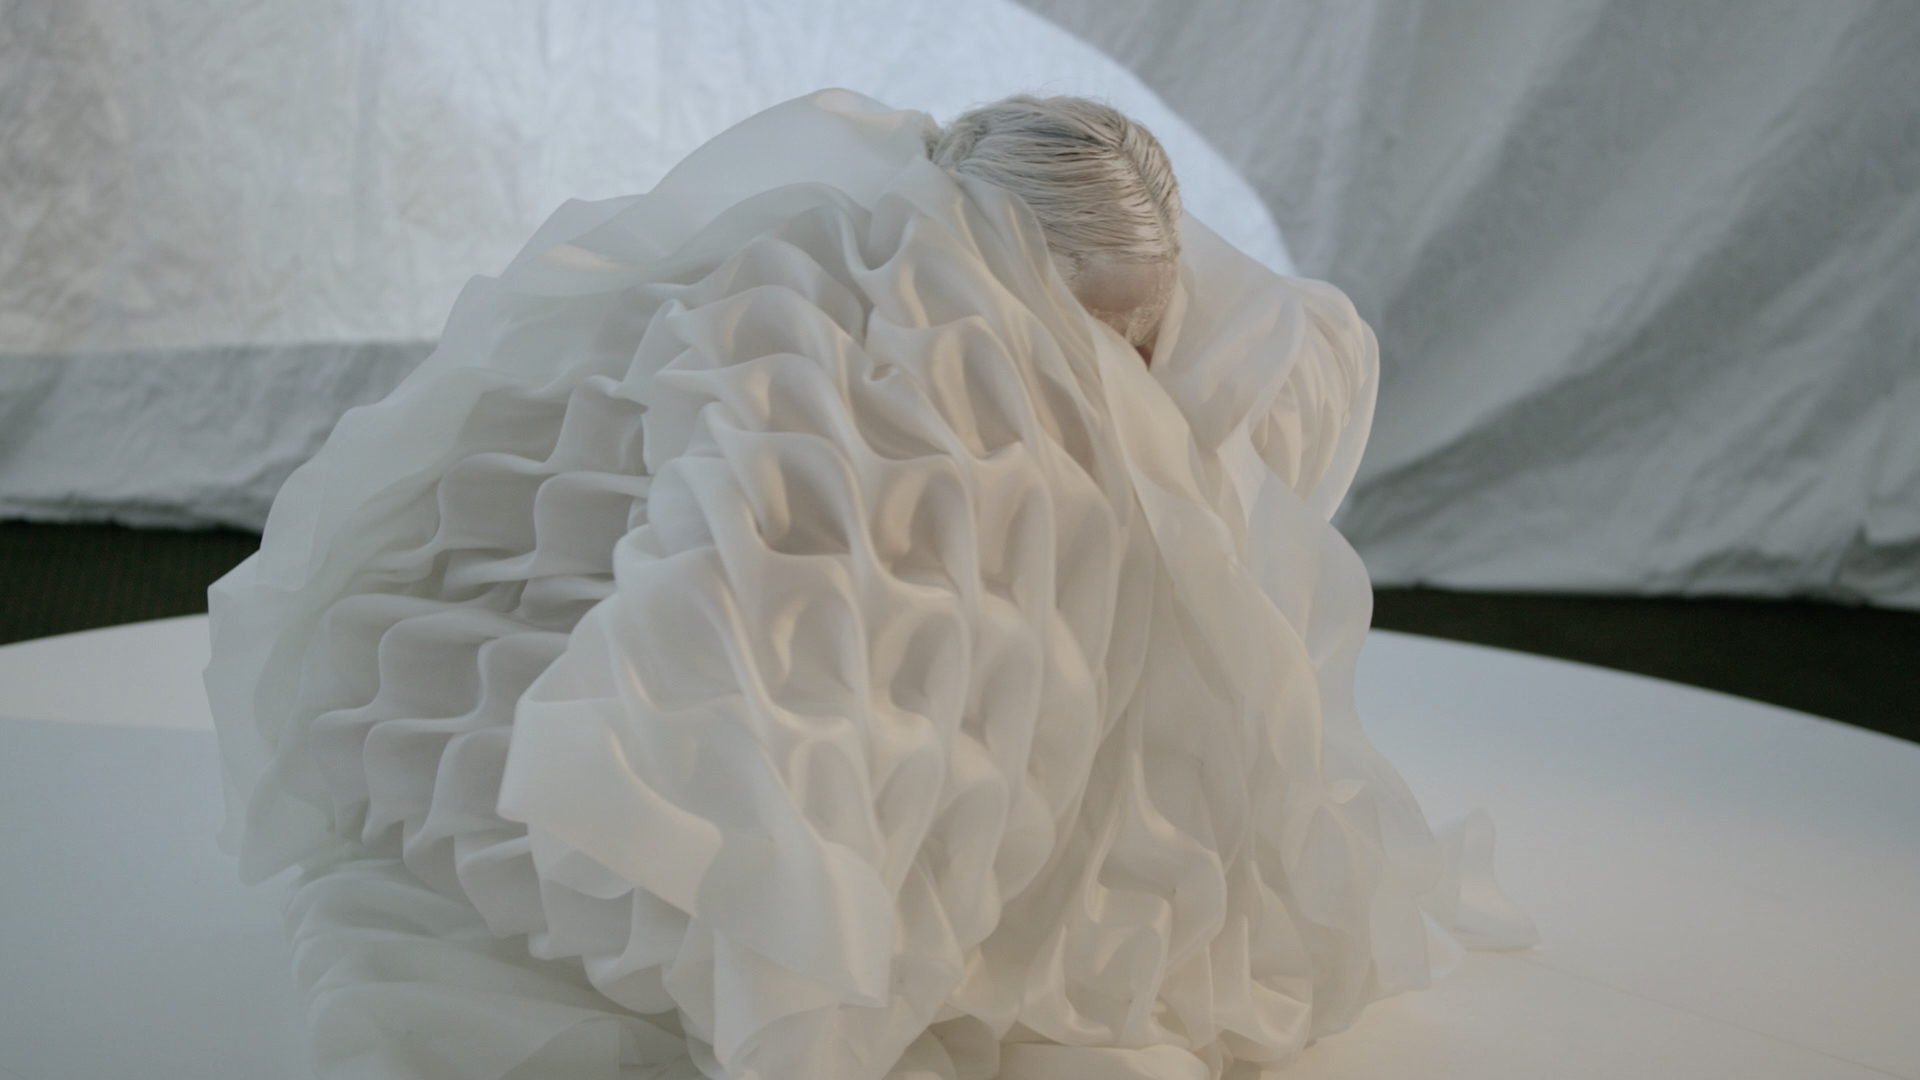 OBAKE - live art installation - Creative Collective Group exhibition M/FW 2017  silk; bonded thread  inhabitable sculpture Anastasia La Fey ; performer/ inhabitant LARVAE collaborator Benjamin Hancock